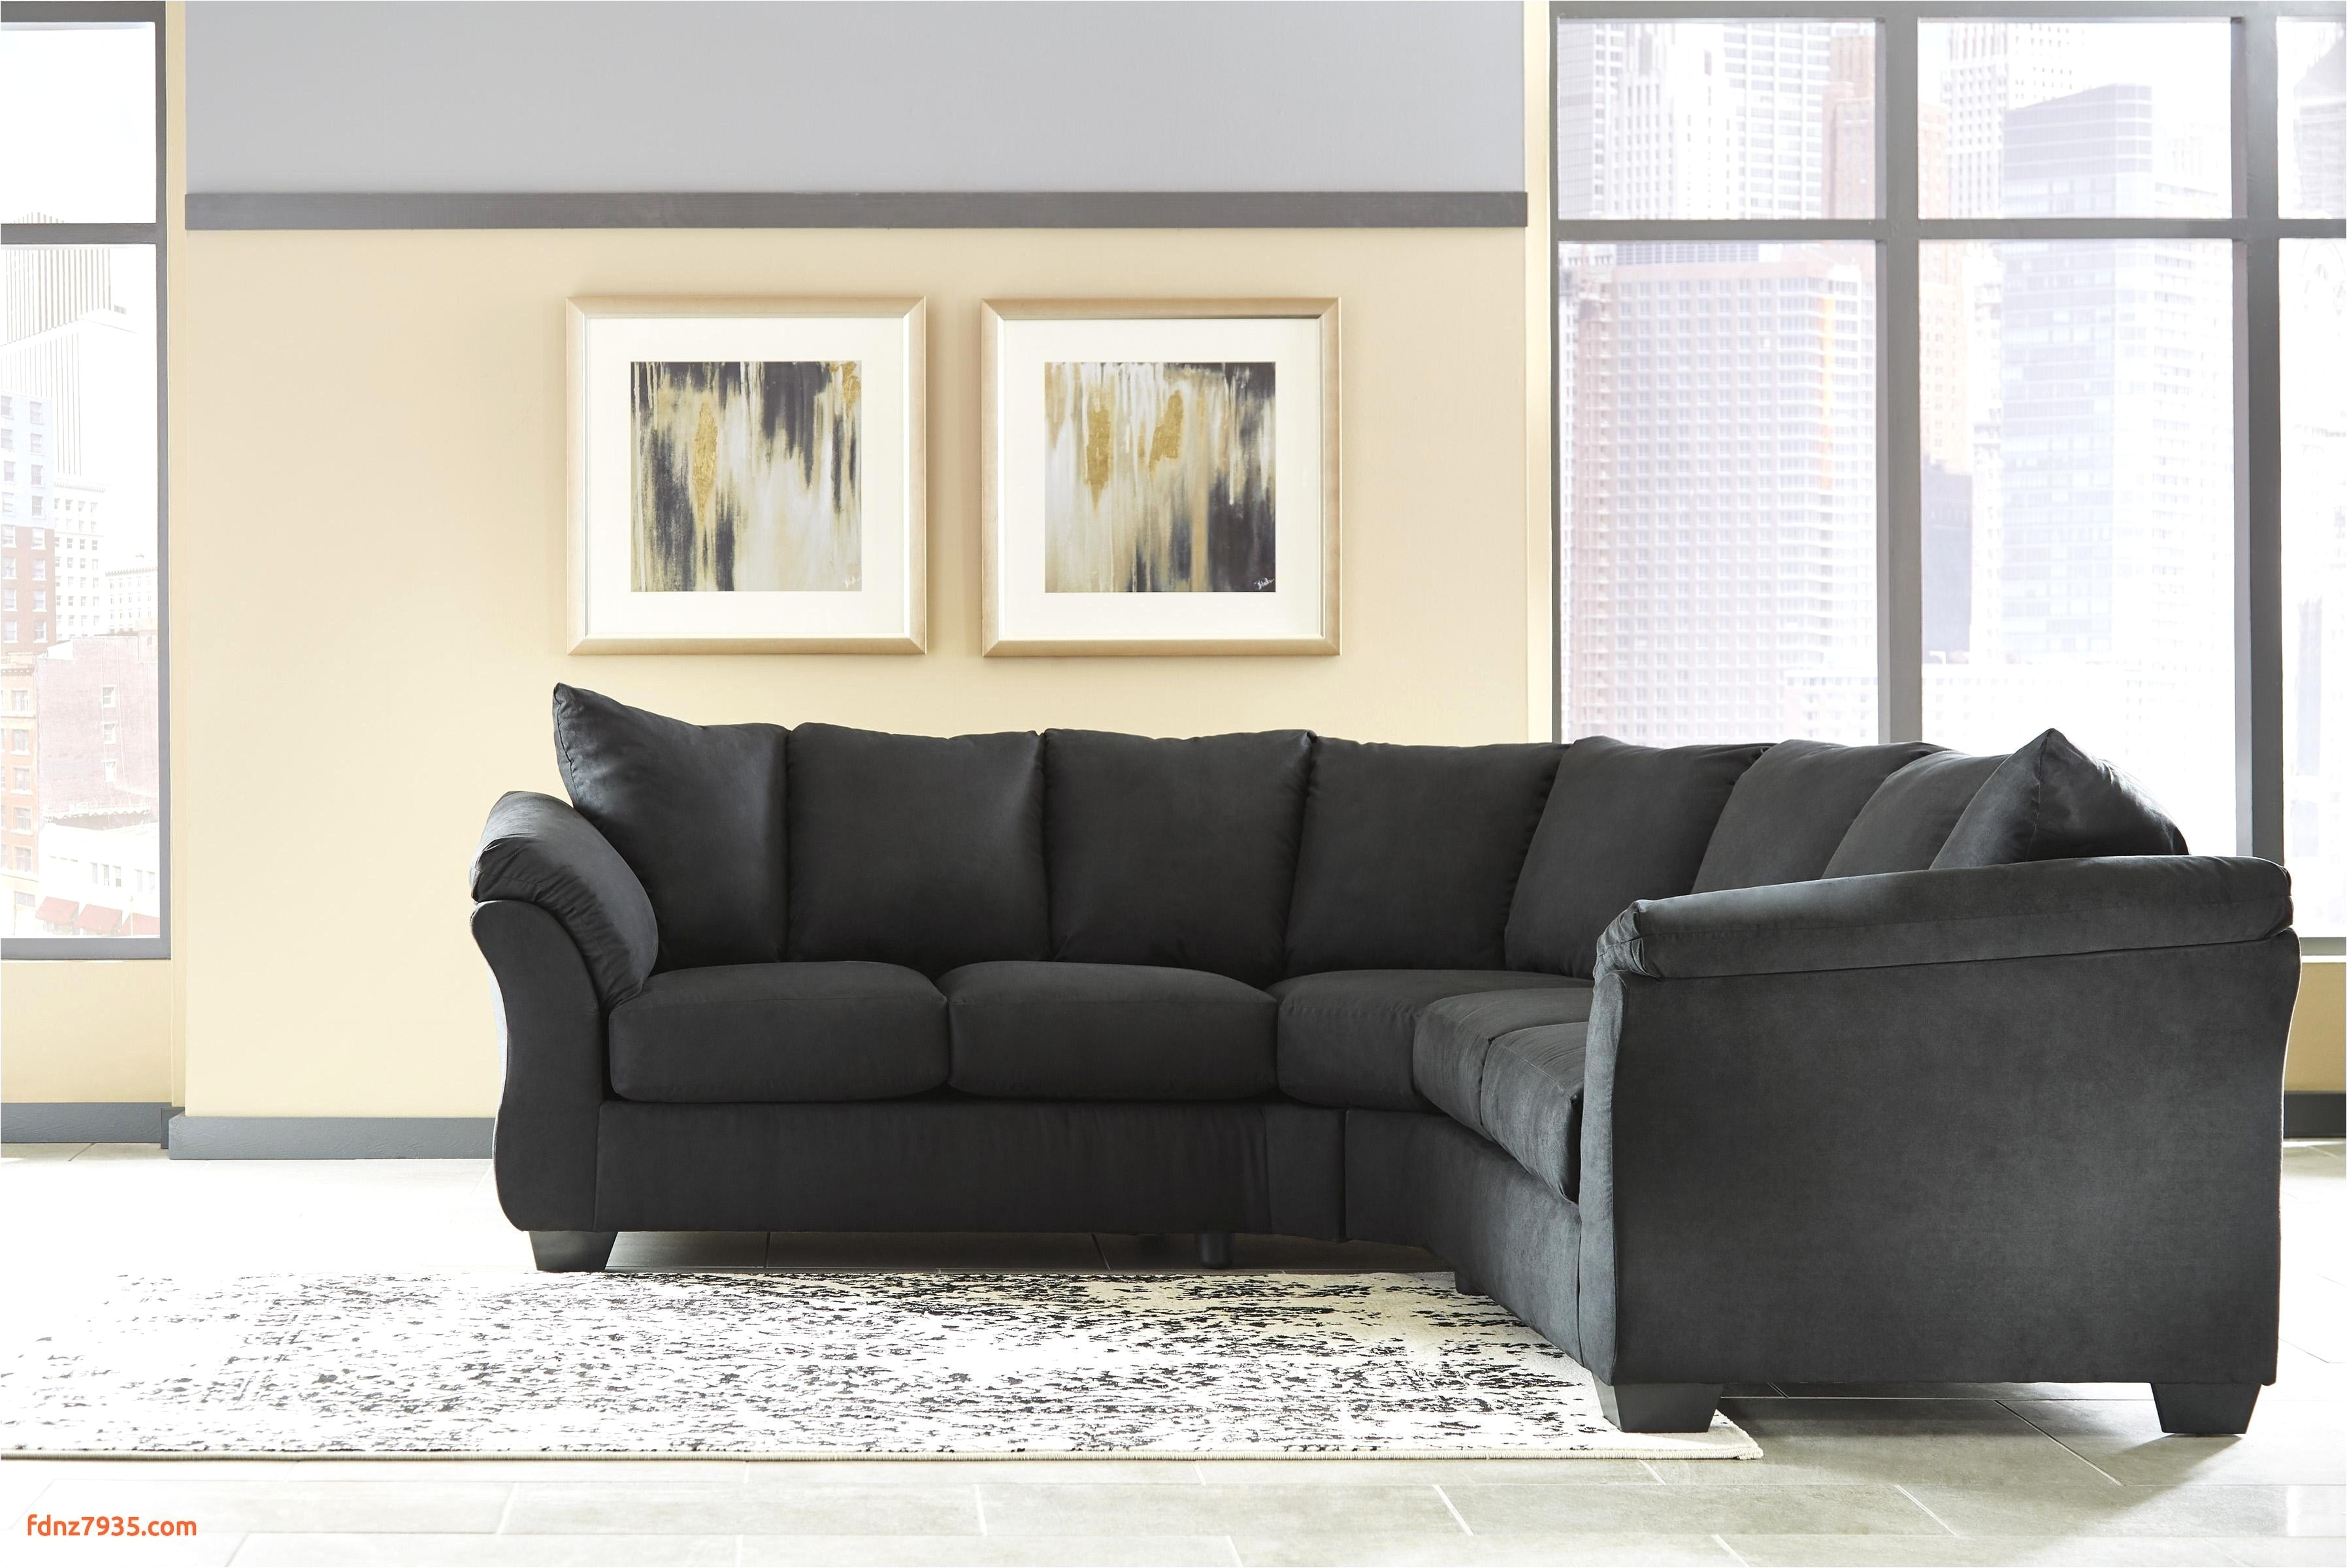 sectional sofa connectors good sofa sectional sleeper fresh sofa design